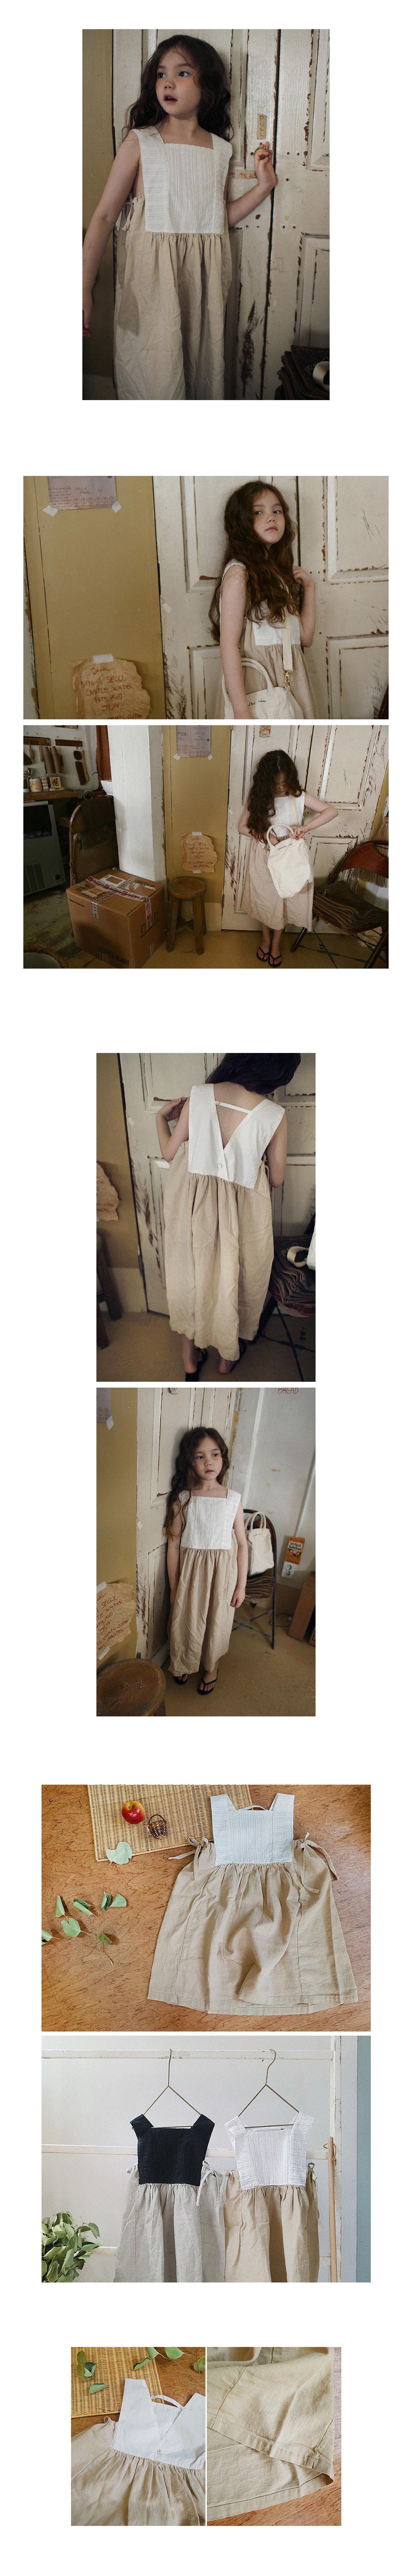 SCON - Korean Children Fashion - #Kfashion4kids - Giselle One-piece - 4